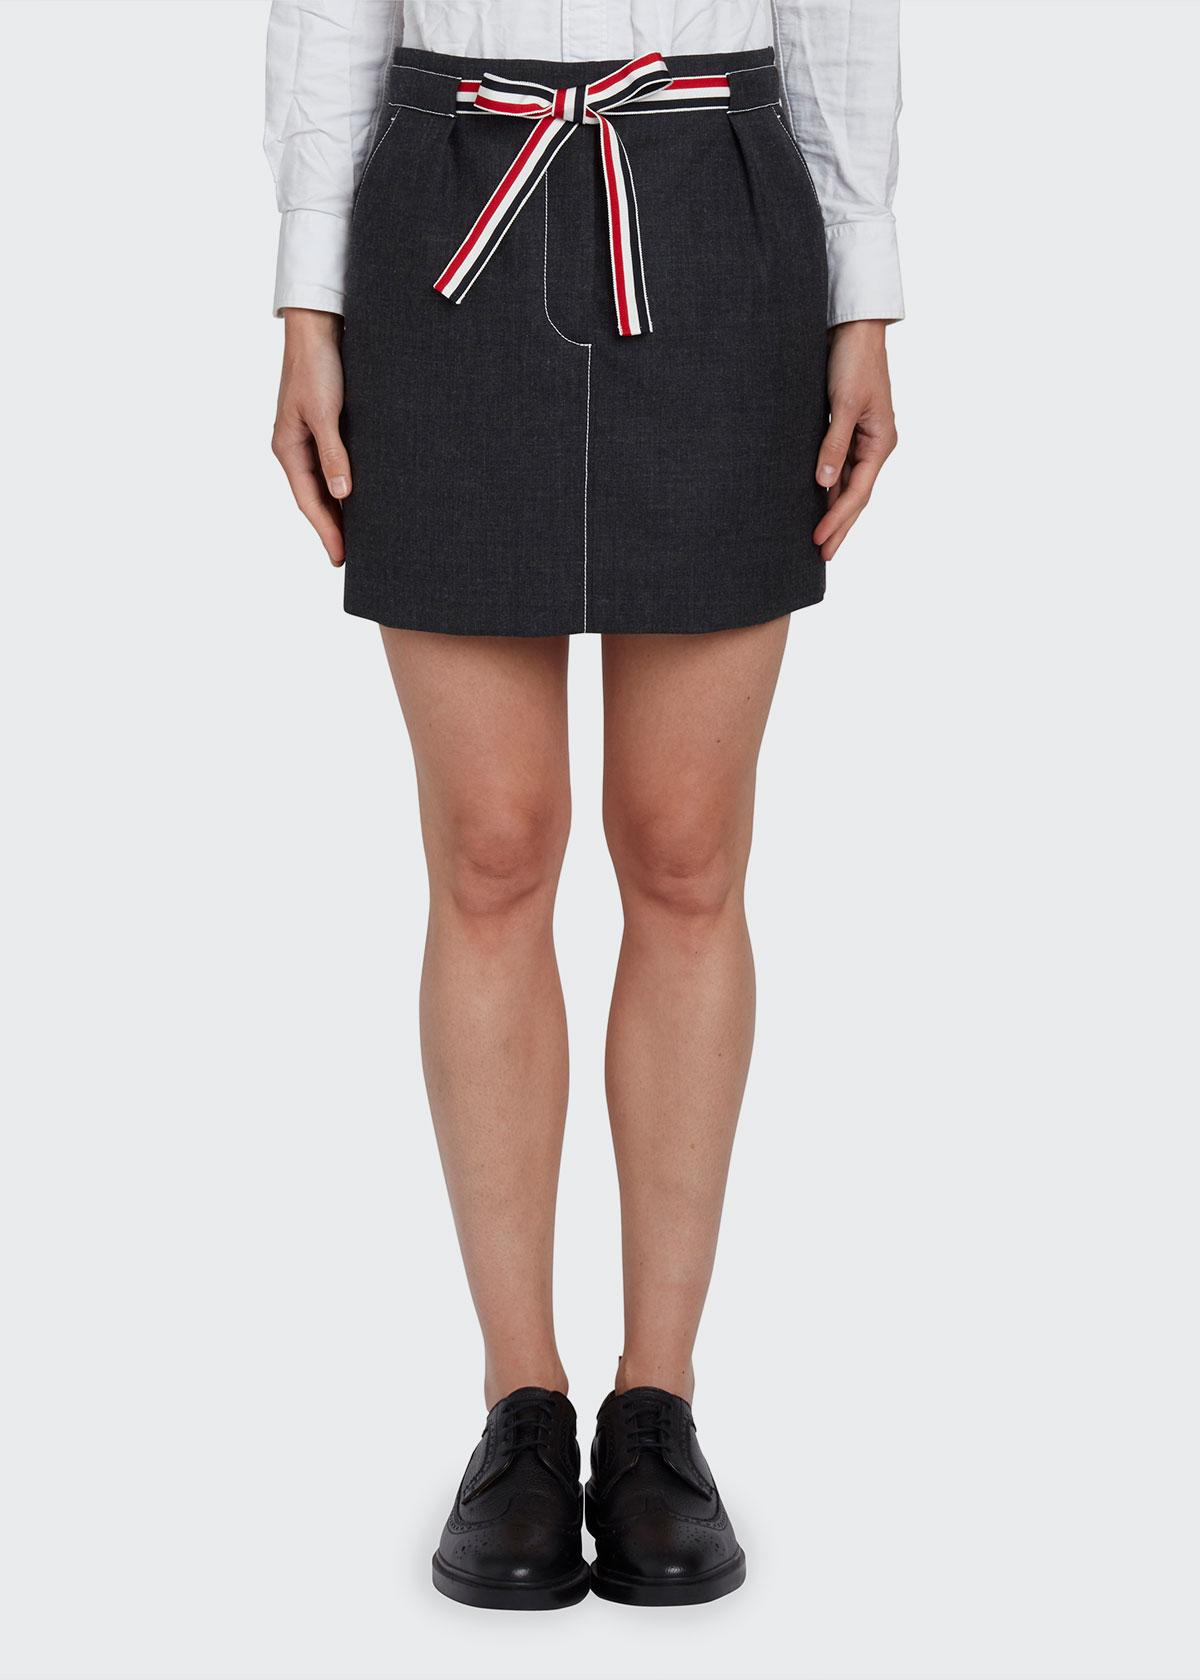 Thom Browne Skirts SELF-TIE MINI WOOL SKIRT